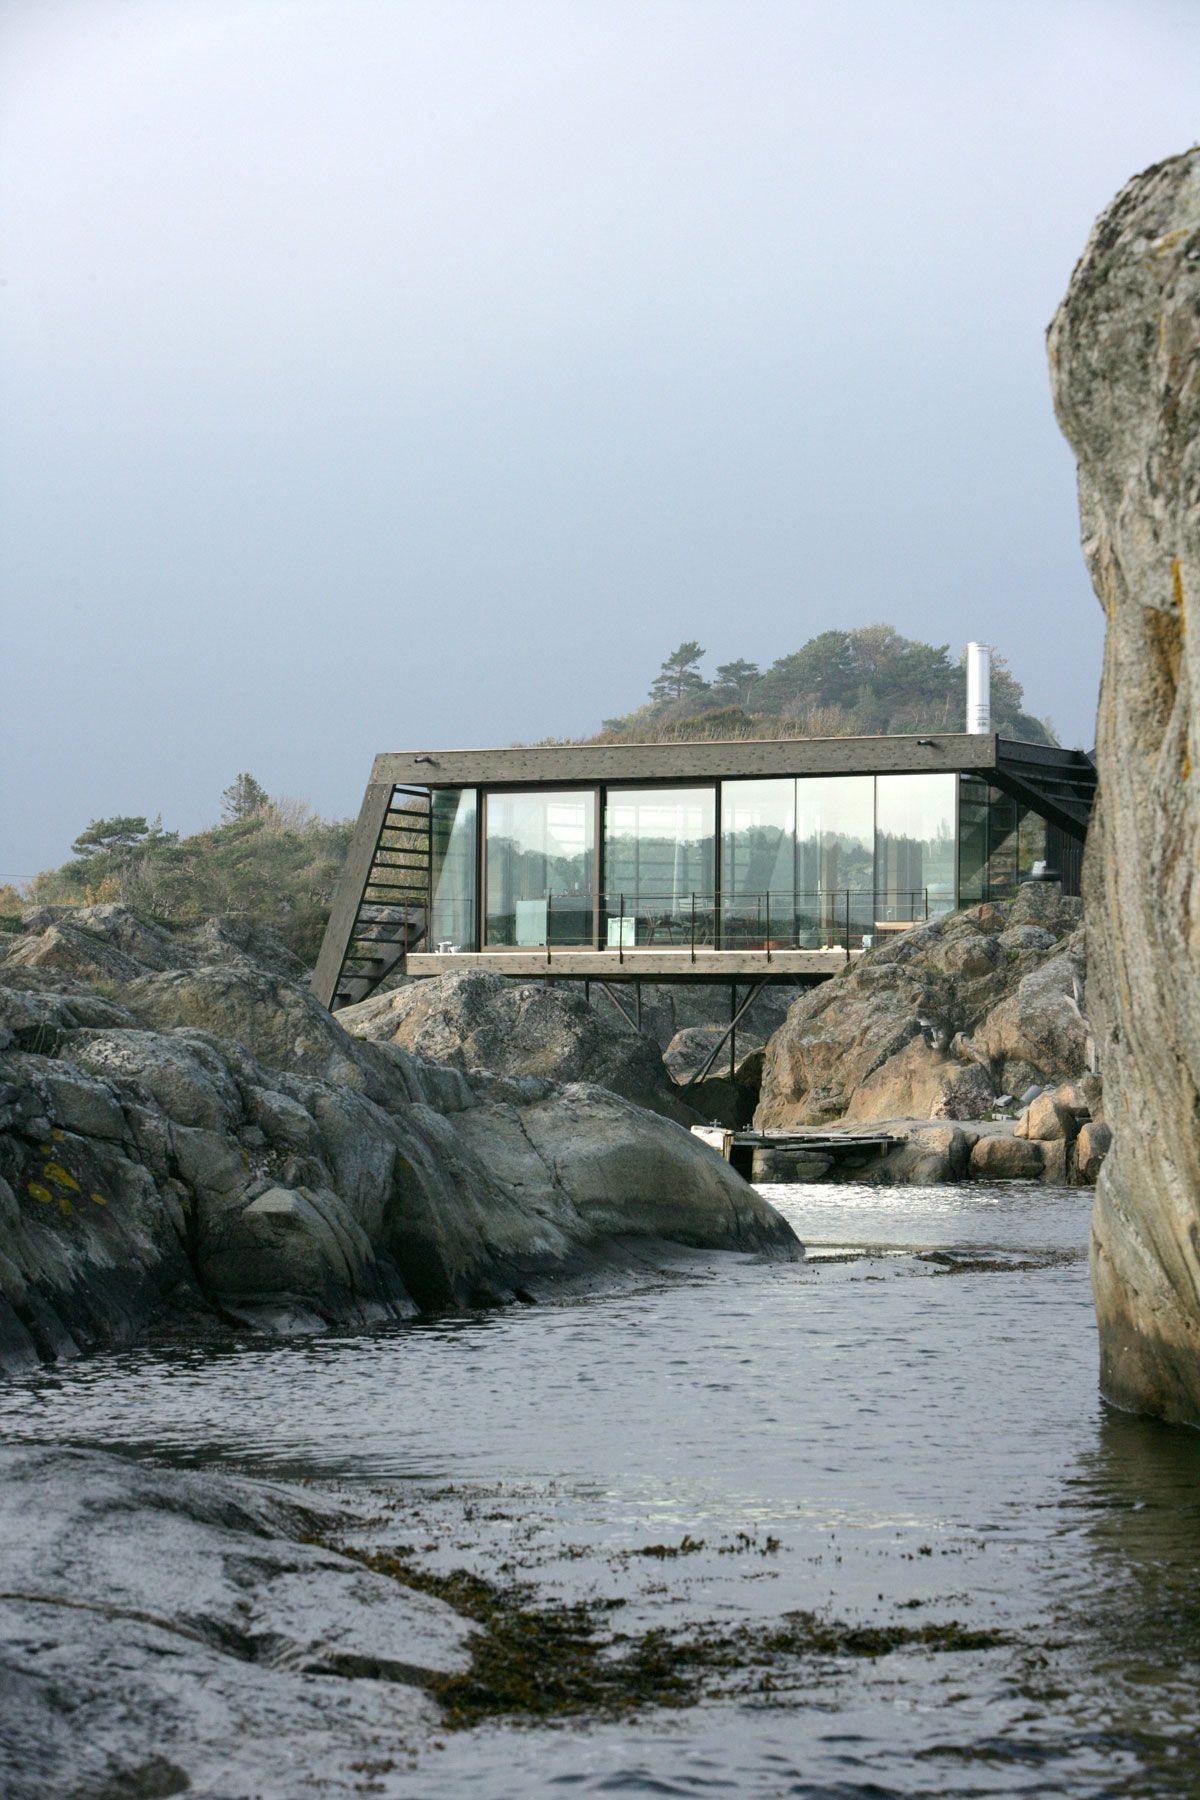 House On Stilts Embraces The Rocky Norwegian Landscape